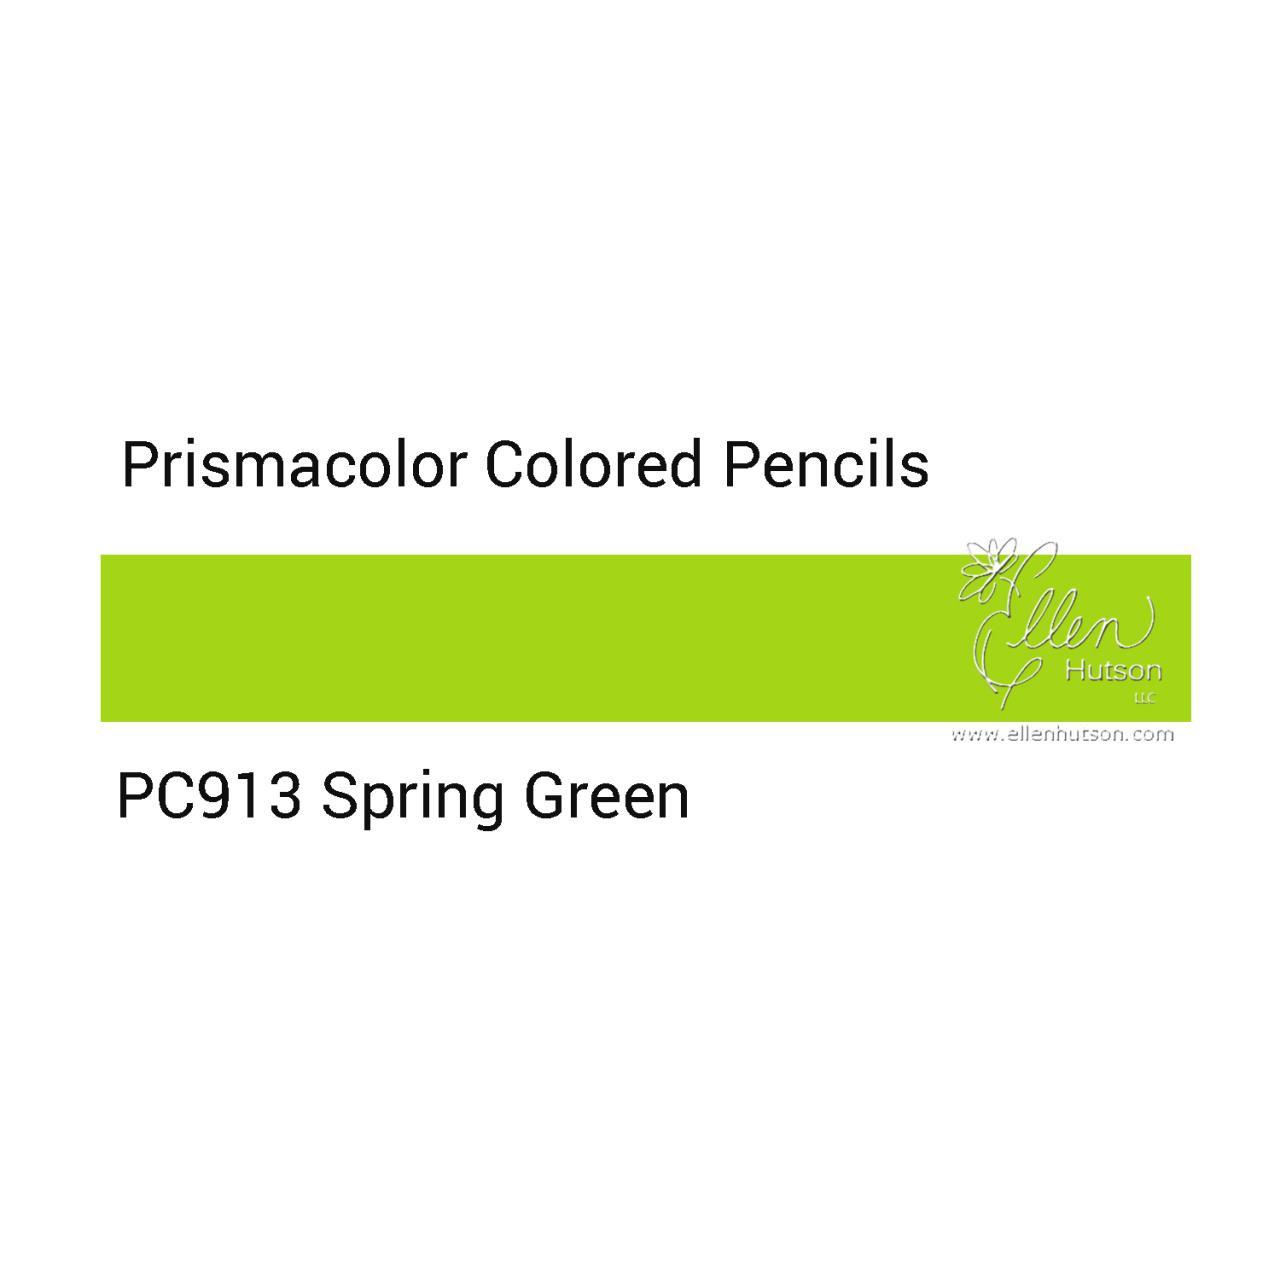 Prismacolor Premier Colored Pencils, Spring Green PC913 - 070735033444